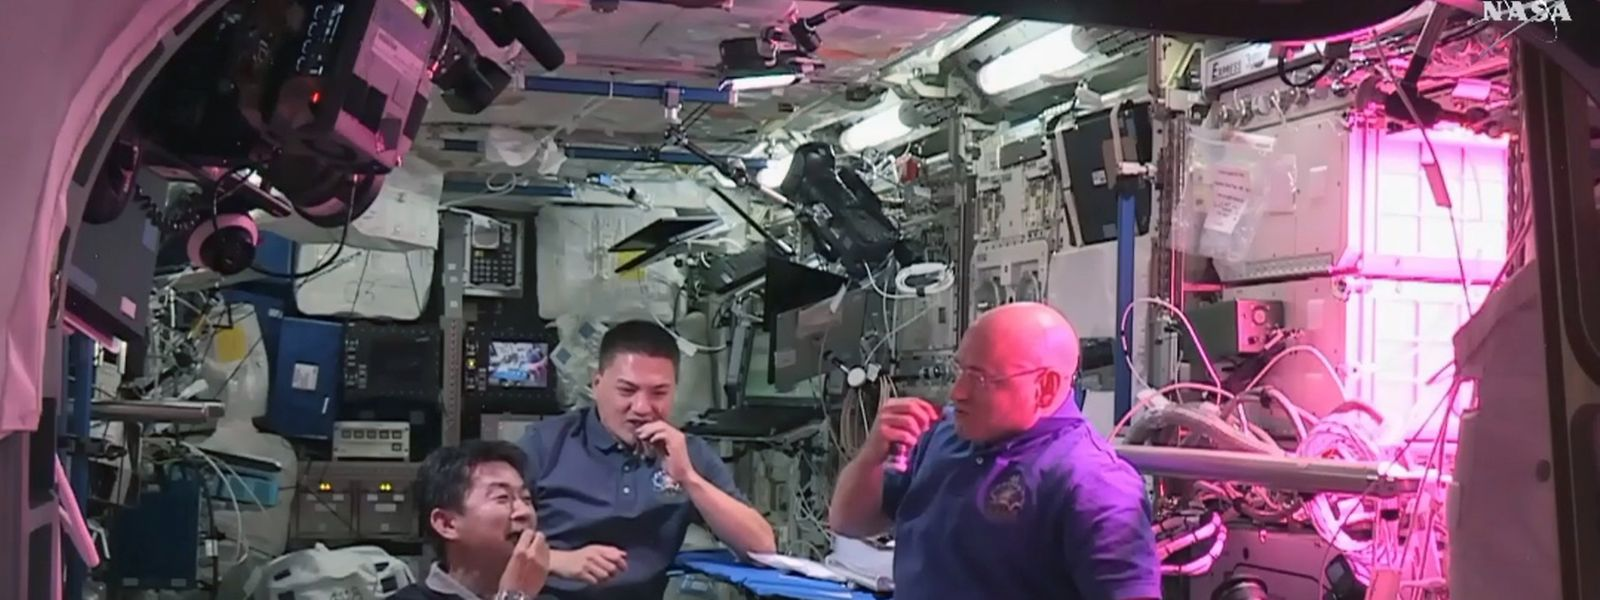 Herzhafter Salatgenuss auf der ISS: Kimiya Yui, Kjell Lindgren und Scott Kelly (v.l.n.r.).